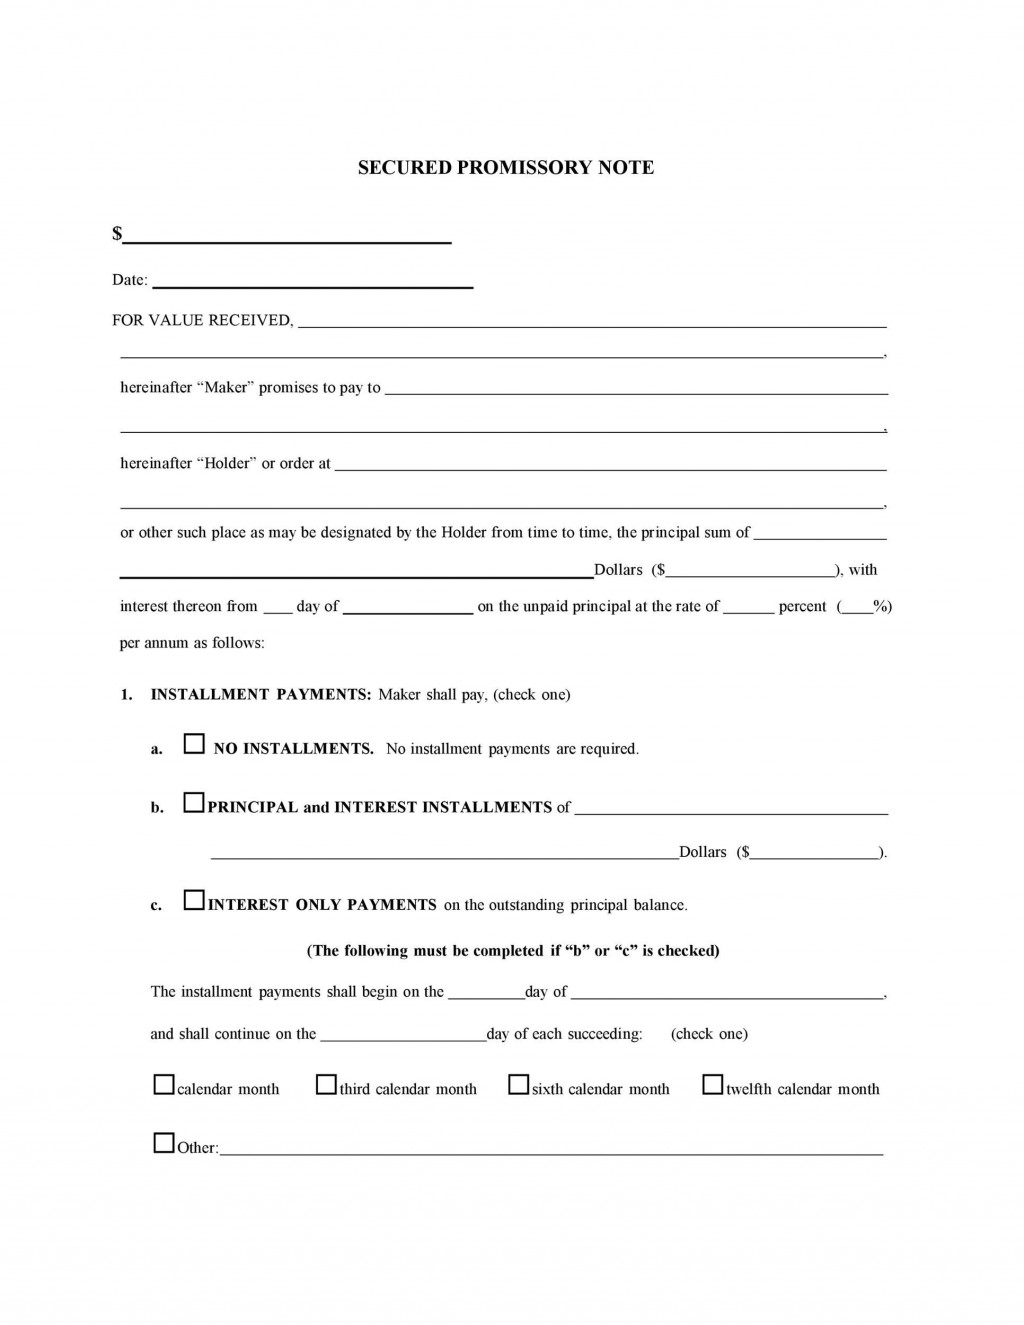 005 Sensational Promissory Note Template Word Image  Document Uk Sample In FormatLarge